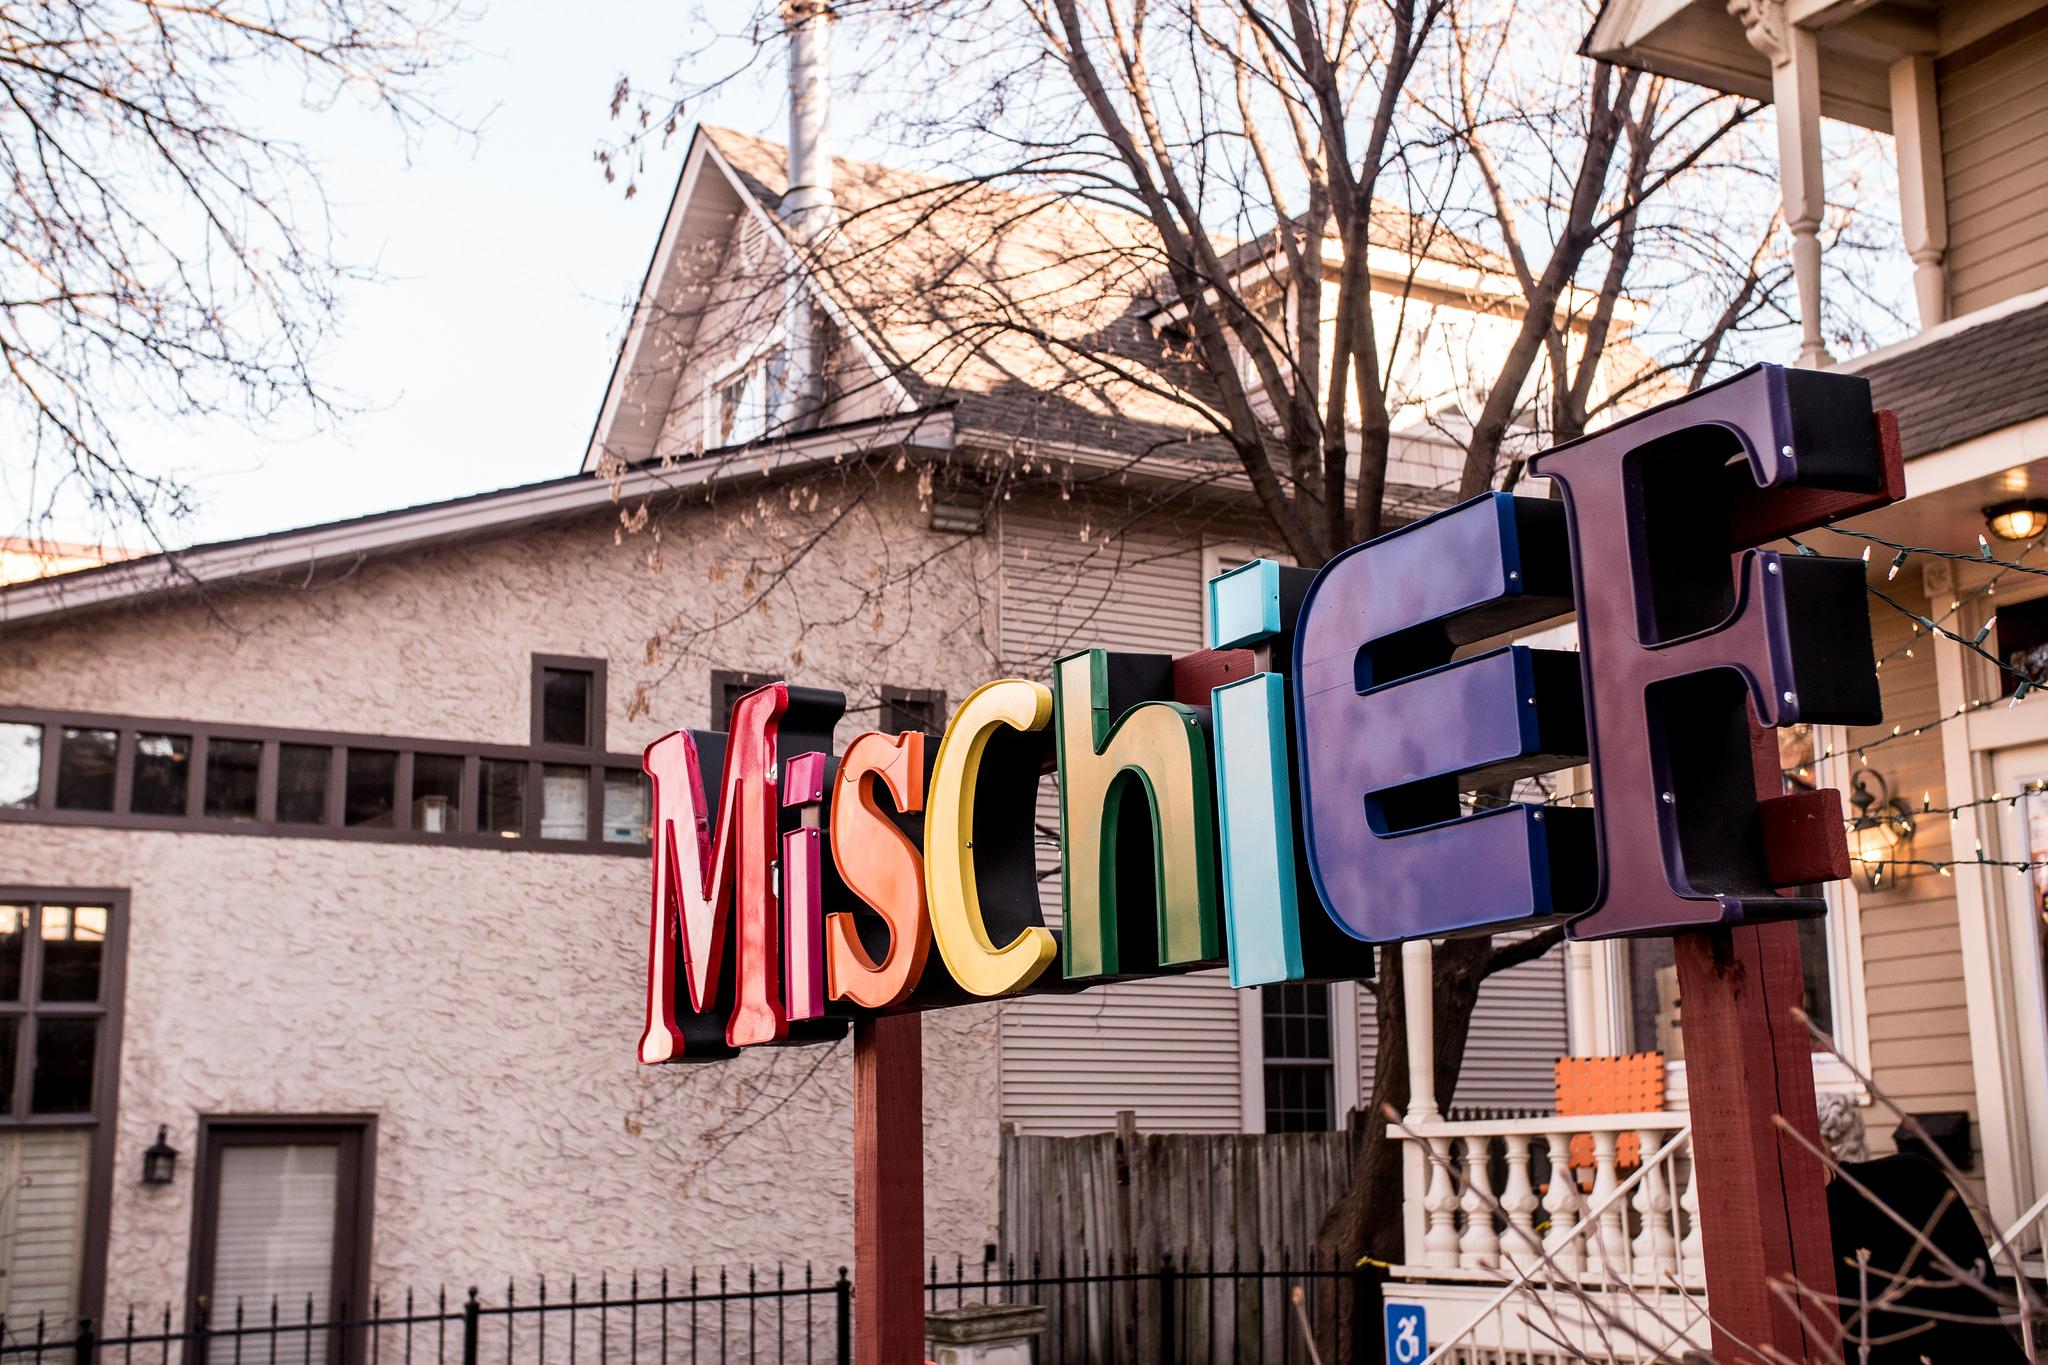 mischief toy store st. paul